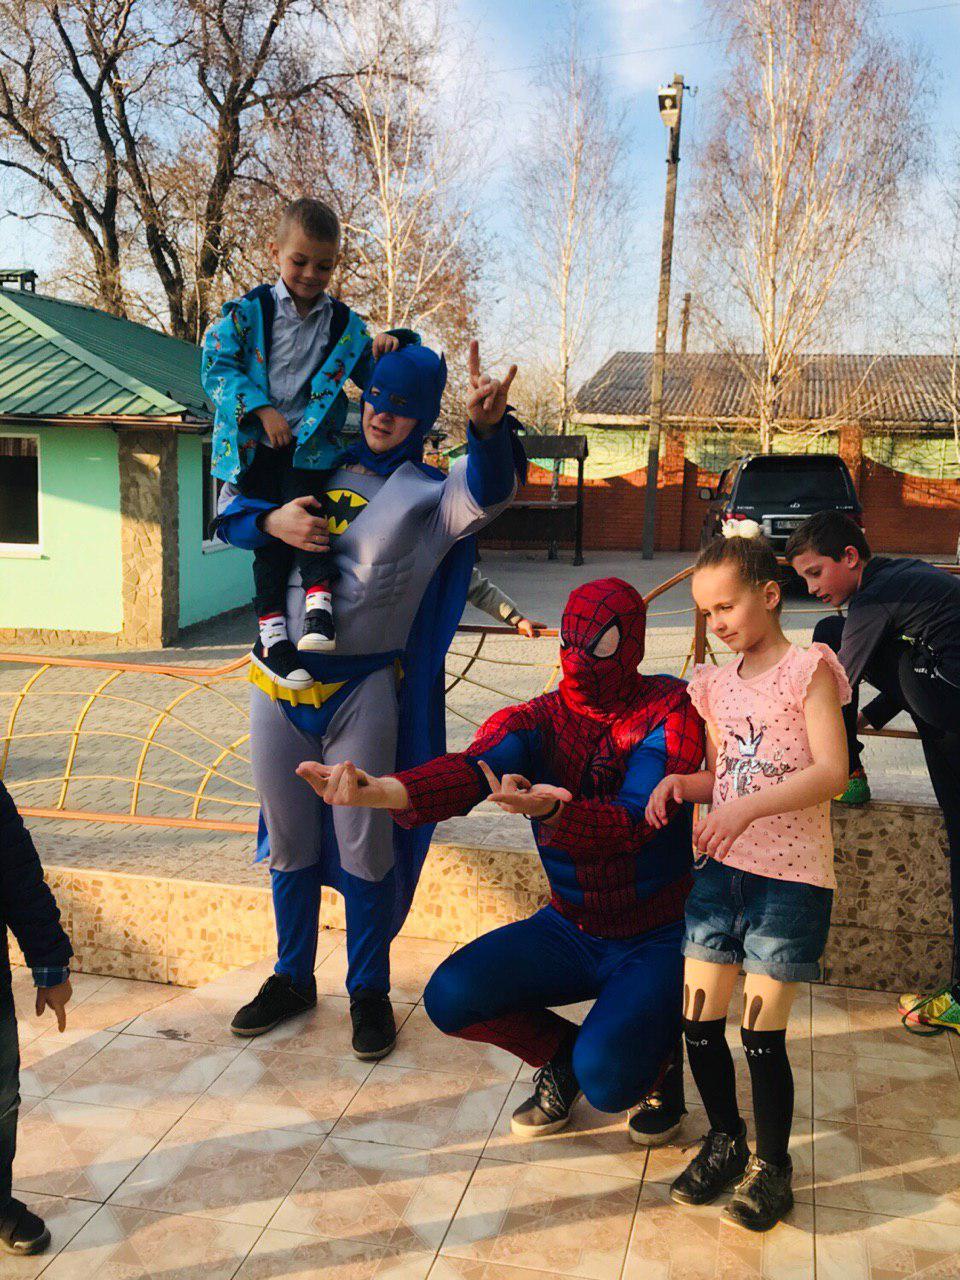 Бэтмен и Спайдермен 7 ивент агентство Птица Днепр